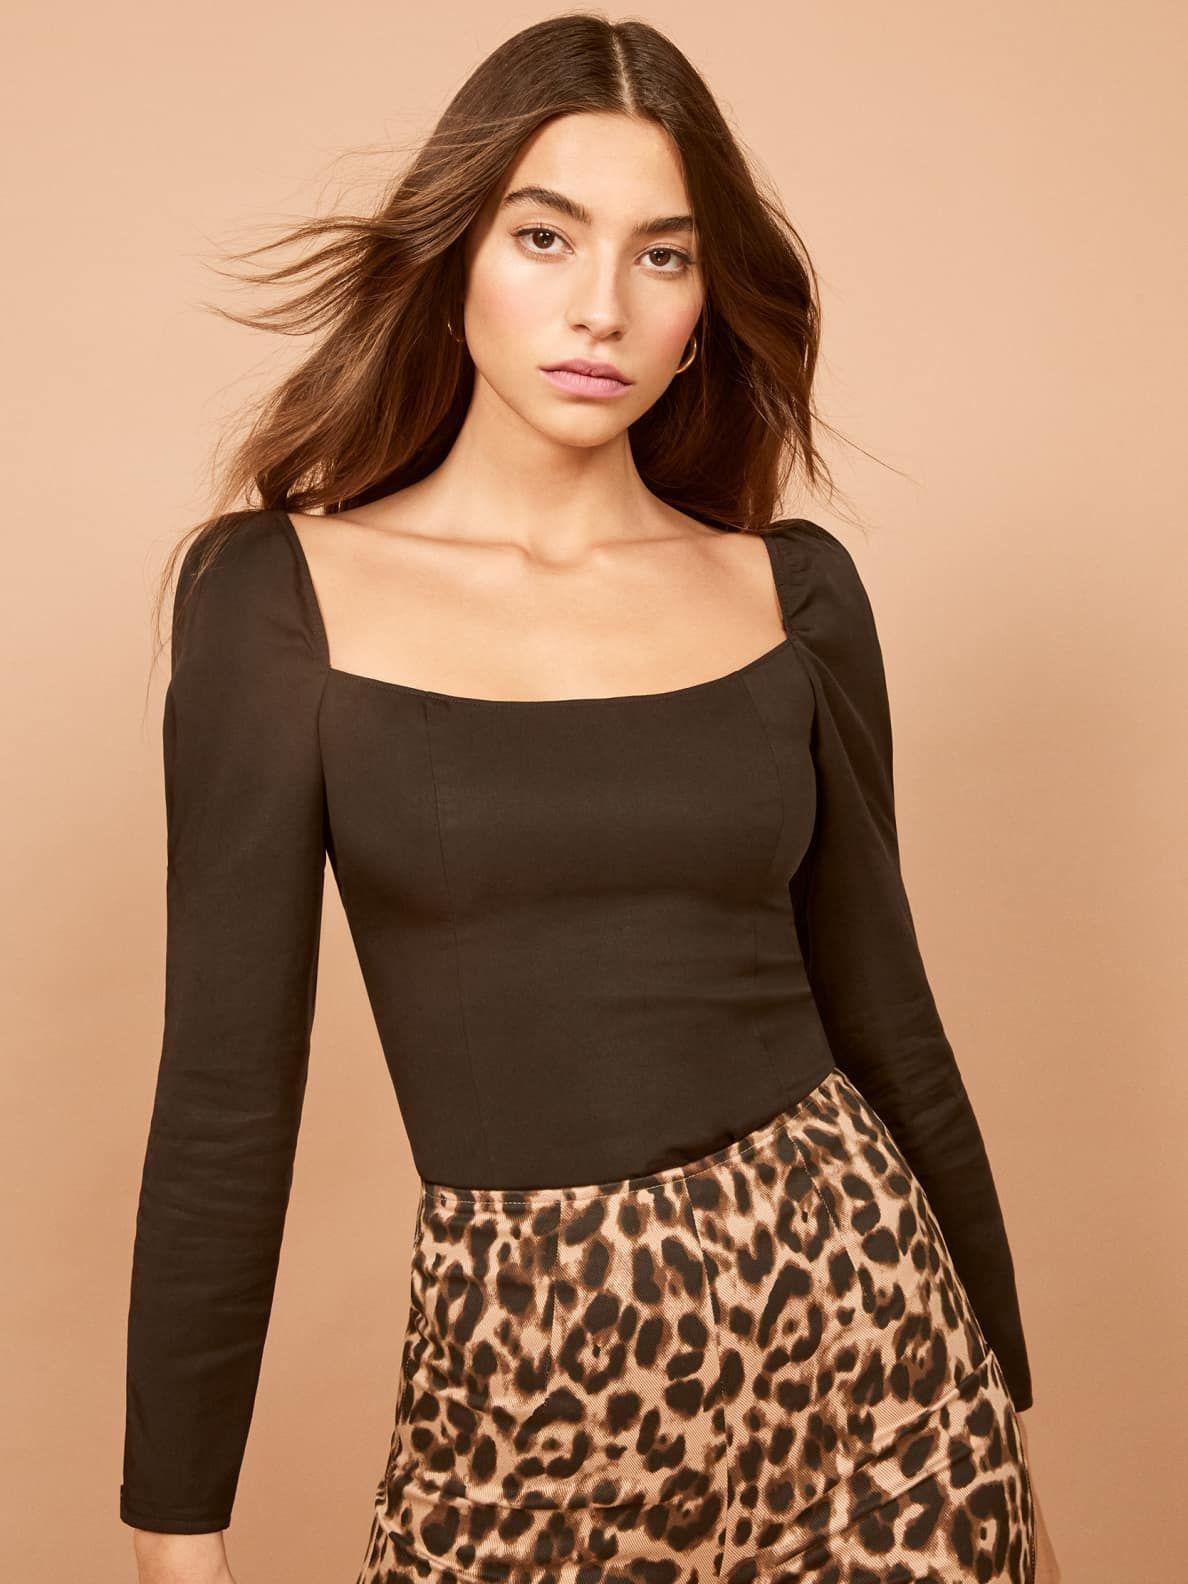 Alexa Top Leather look dress, Leopard print bodycon